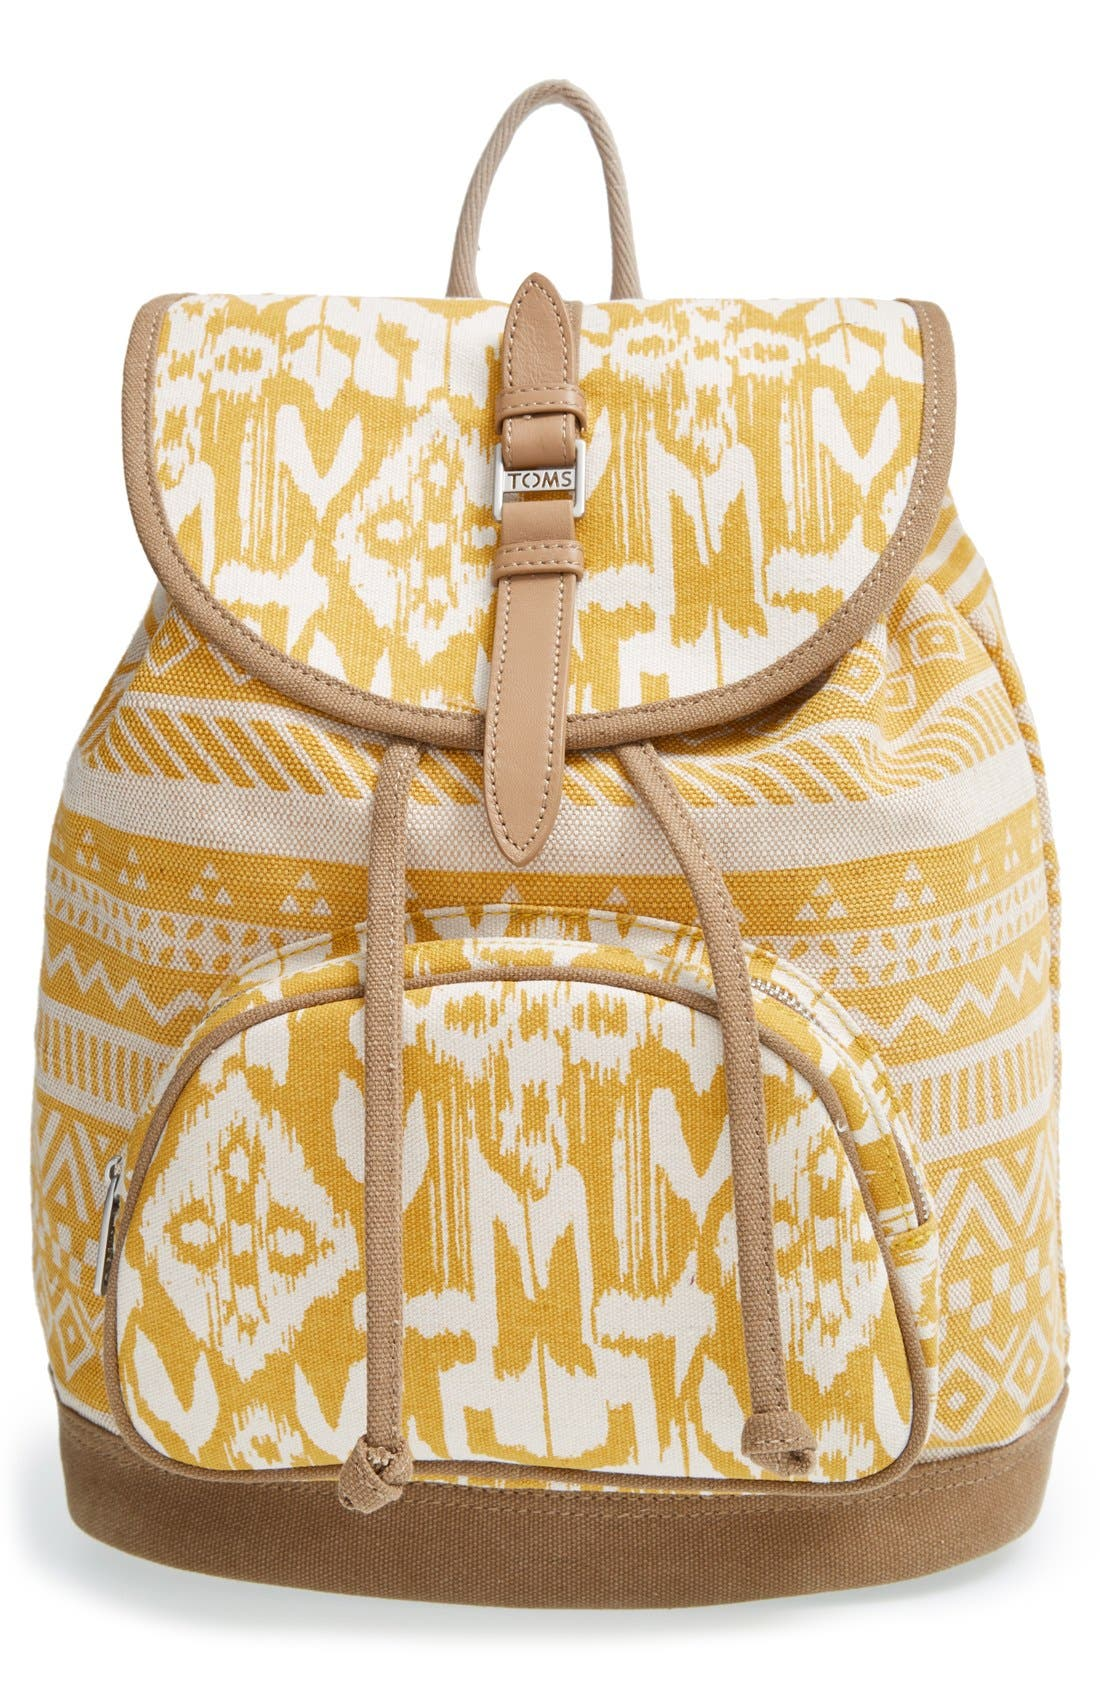 Main Image - TOMS 'Traveler' Canvas Backpack